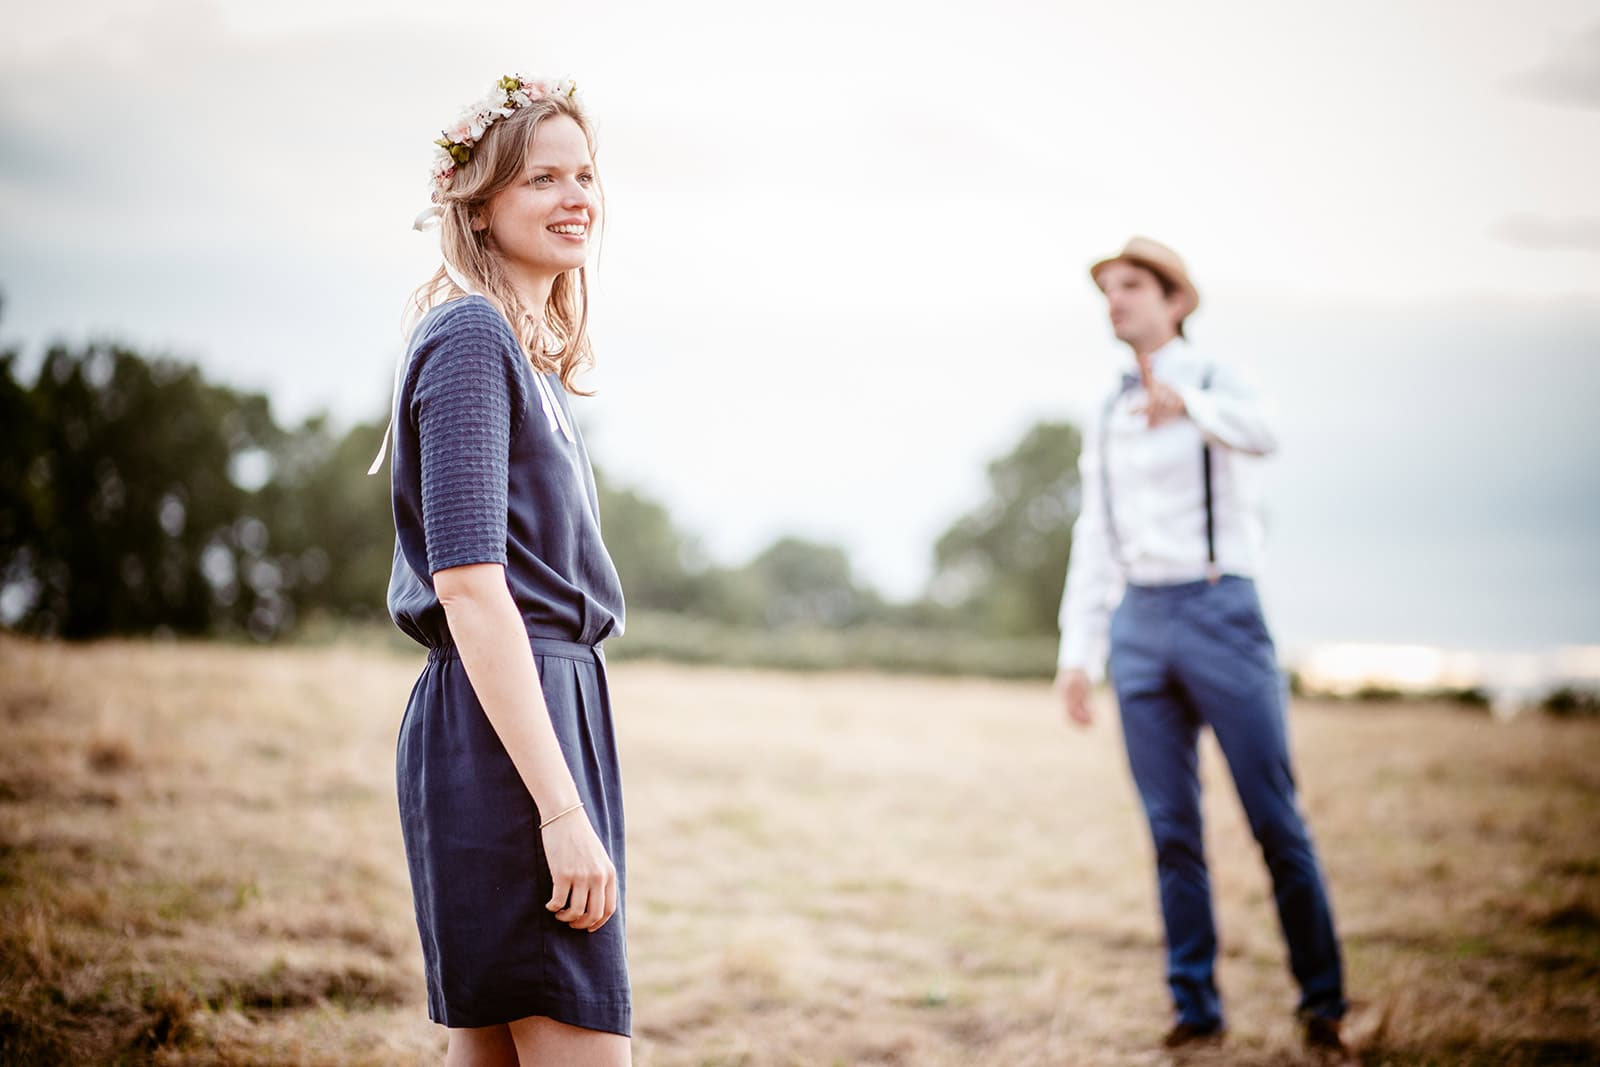 meilleurs avis photographe de mariage Bourgogne Photographe de mariage boho bourgogne Castille ALMA